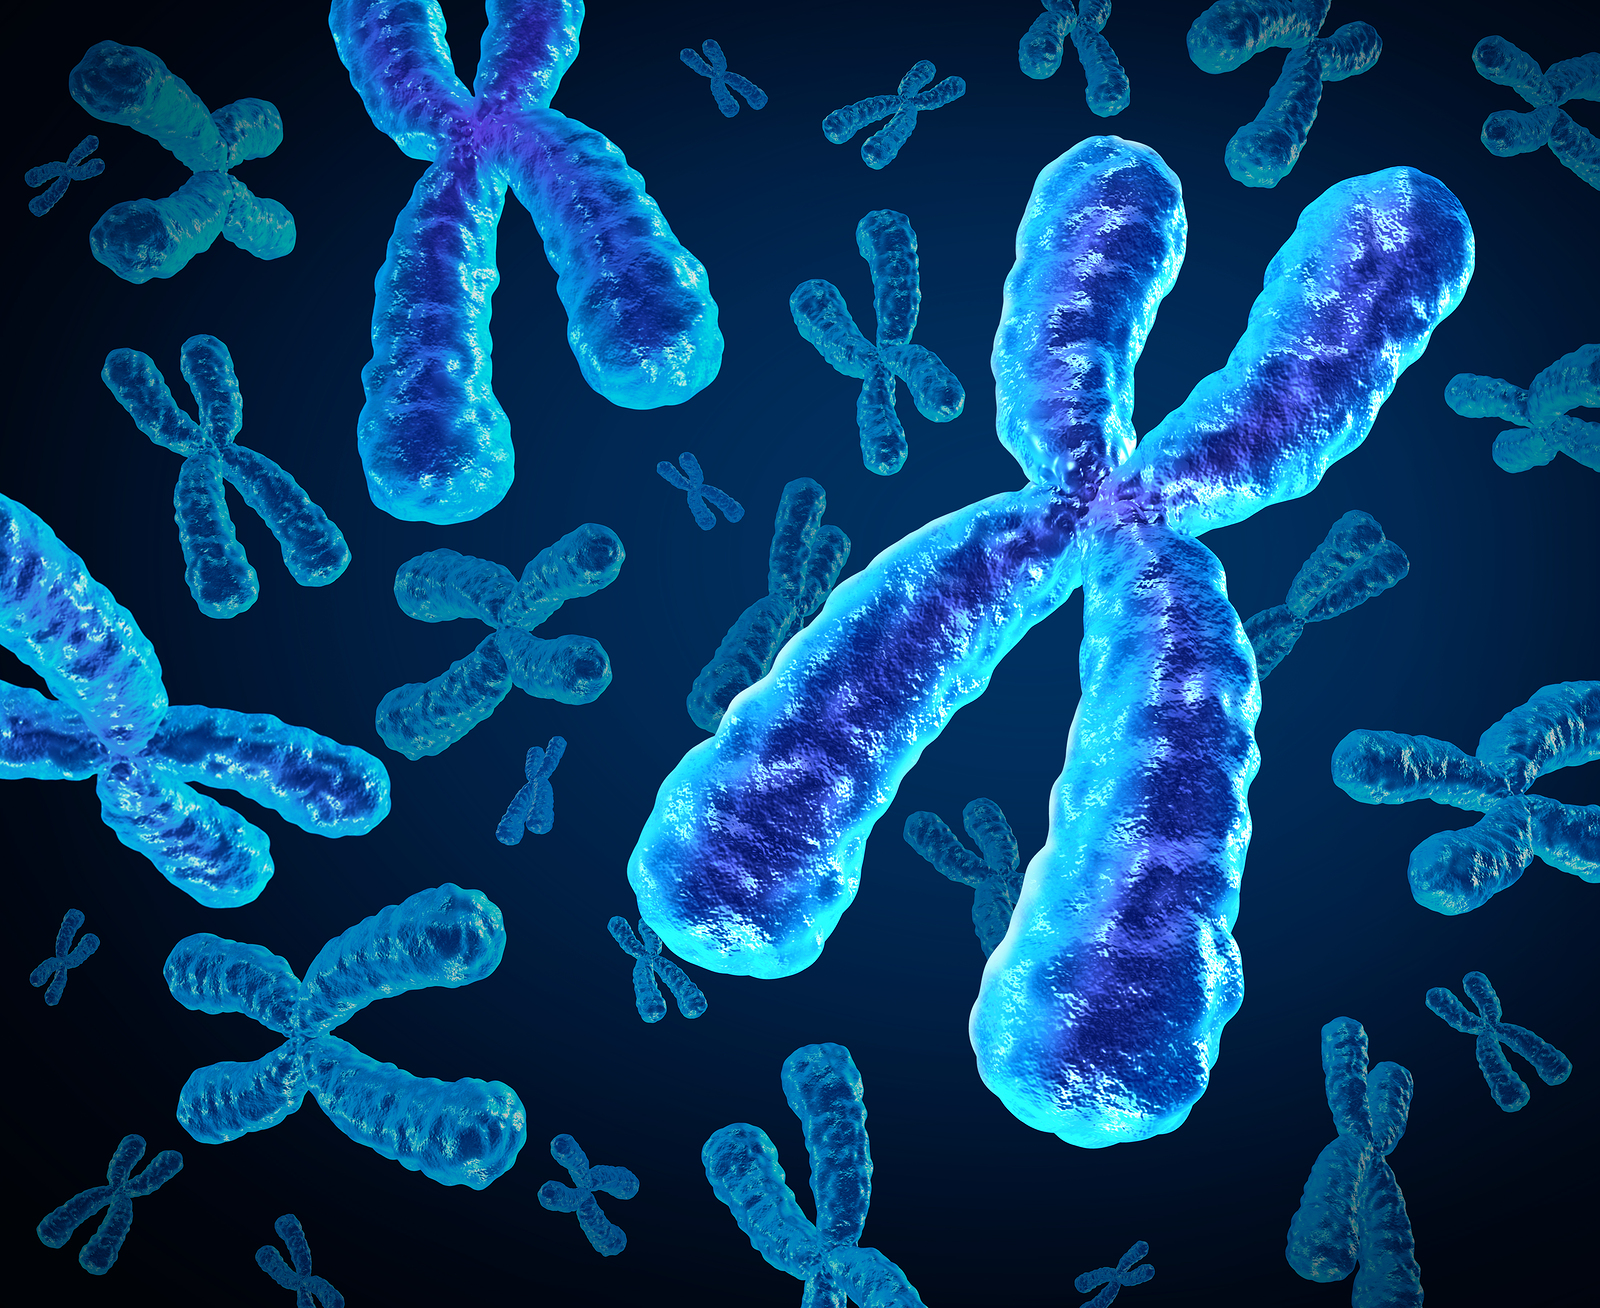 Asymmetrex Renews Efforts to Help Gene-Editing Companies